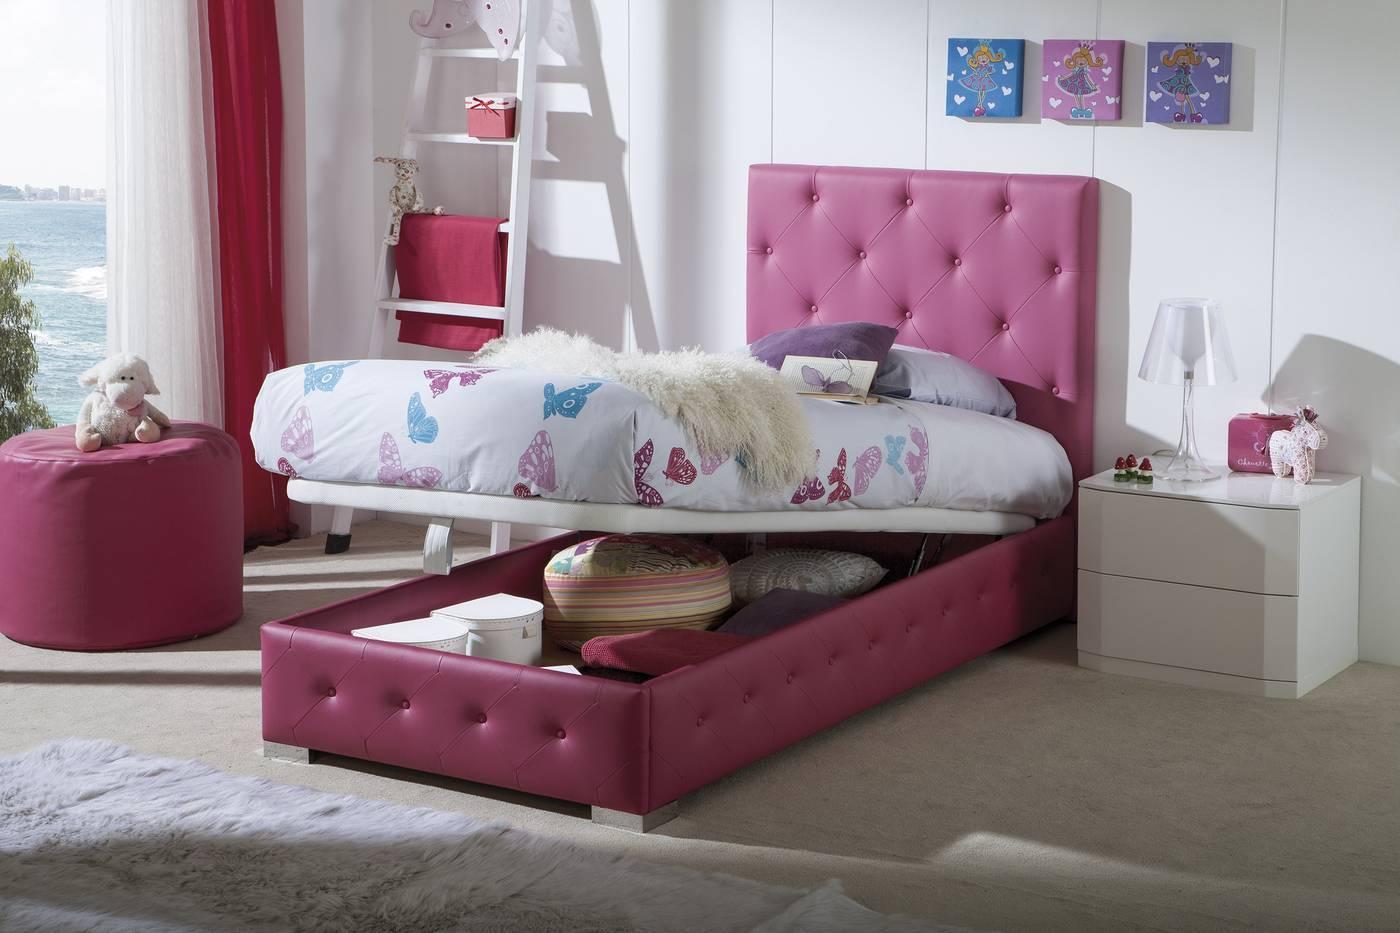 Camas para juveniles dormitorios romnticos en tonos - Camas para chicas ...